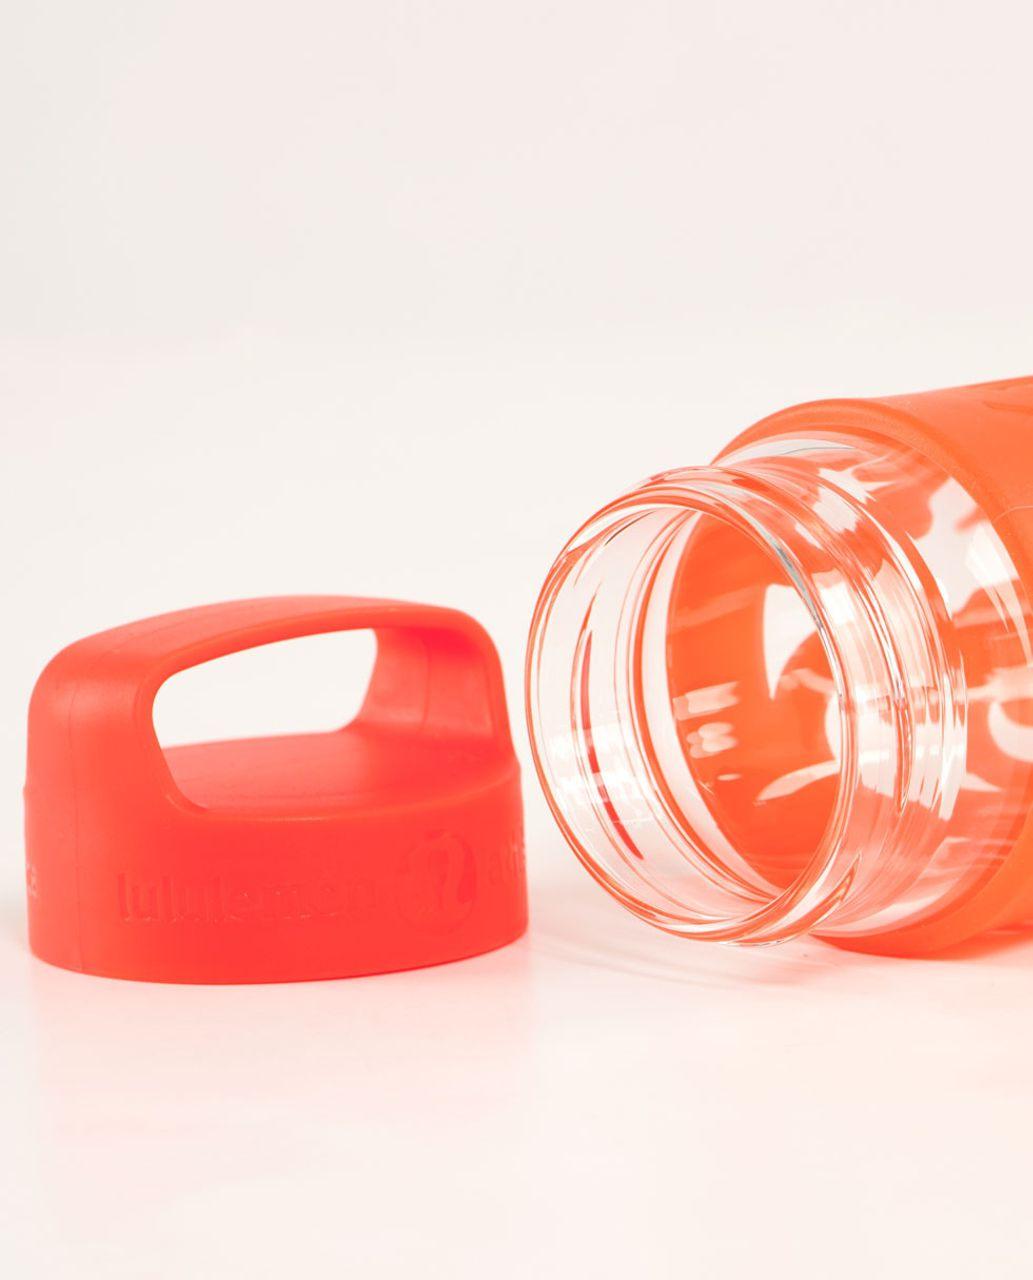 Lululemon Pure Balance Water Bottle - Light Flare